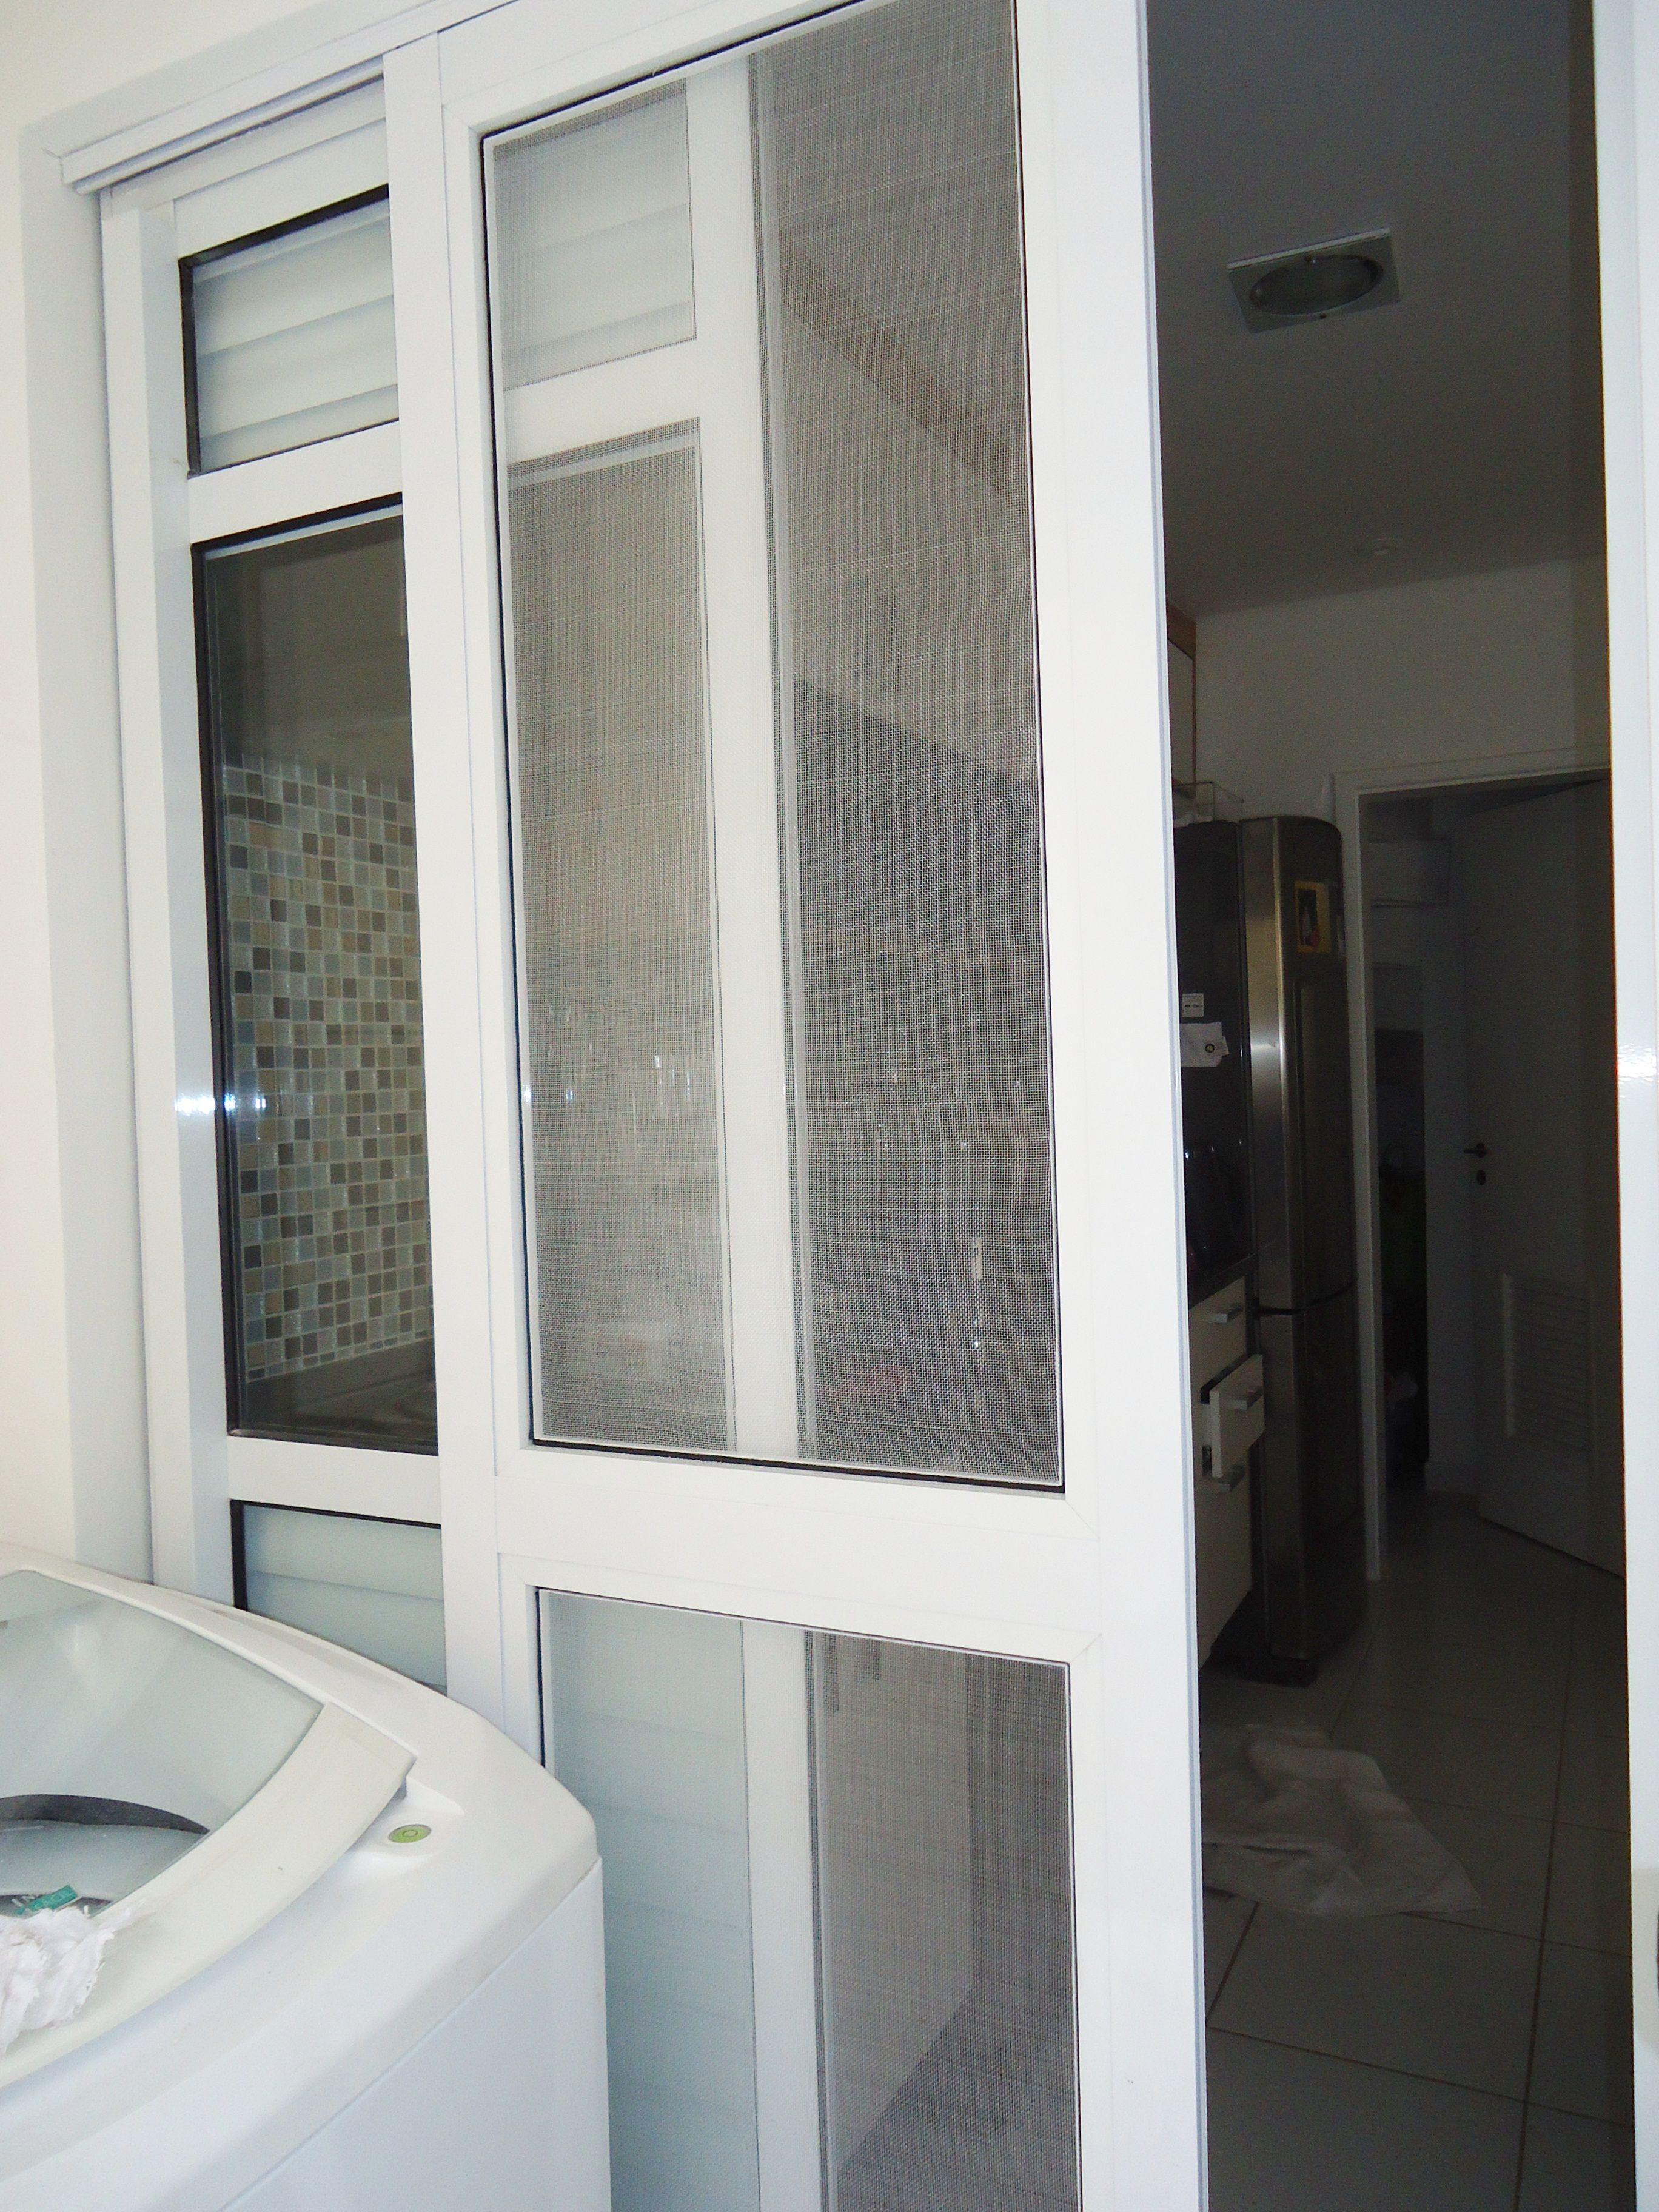 Porta De Aluminio Branco Para A Area De Servico E Cozinha Sendo